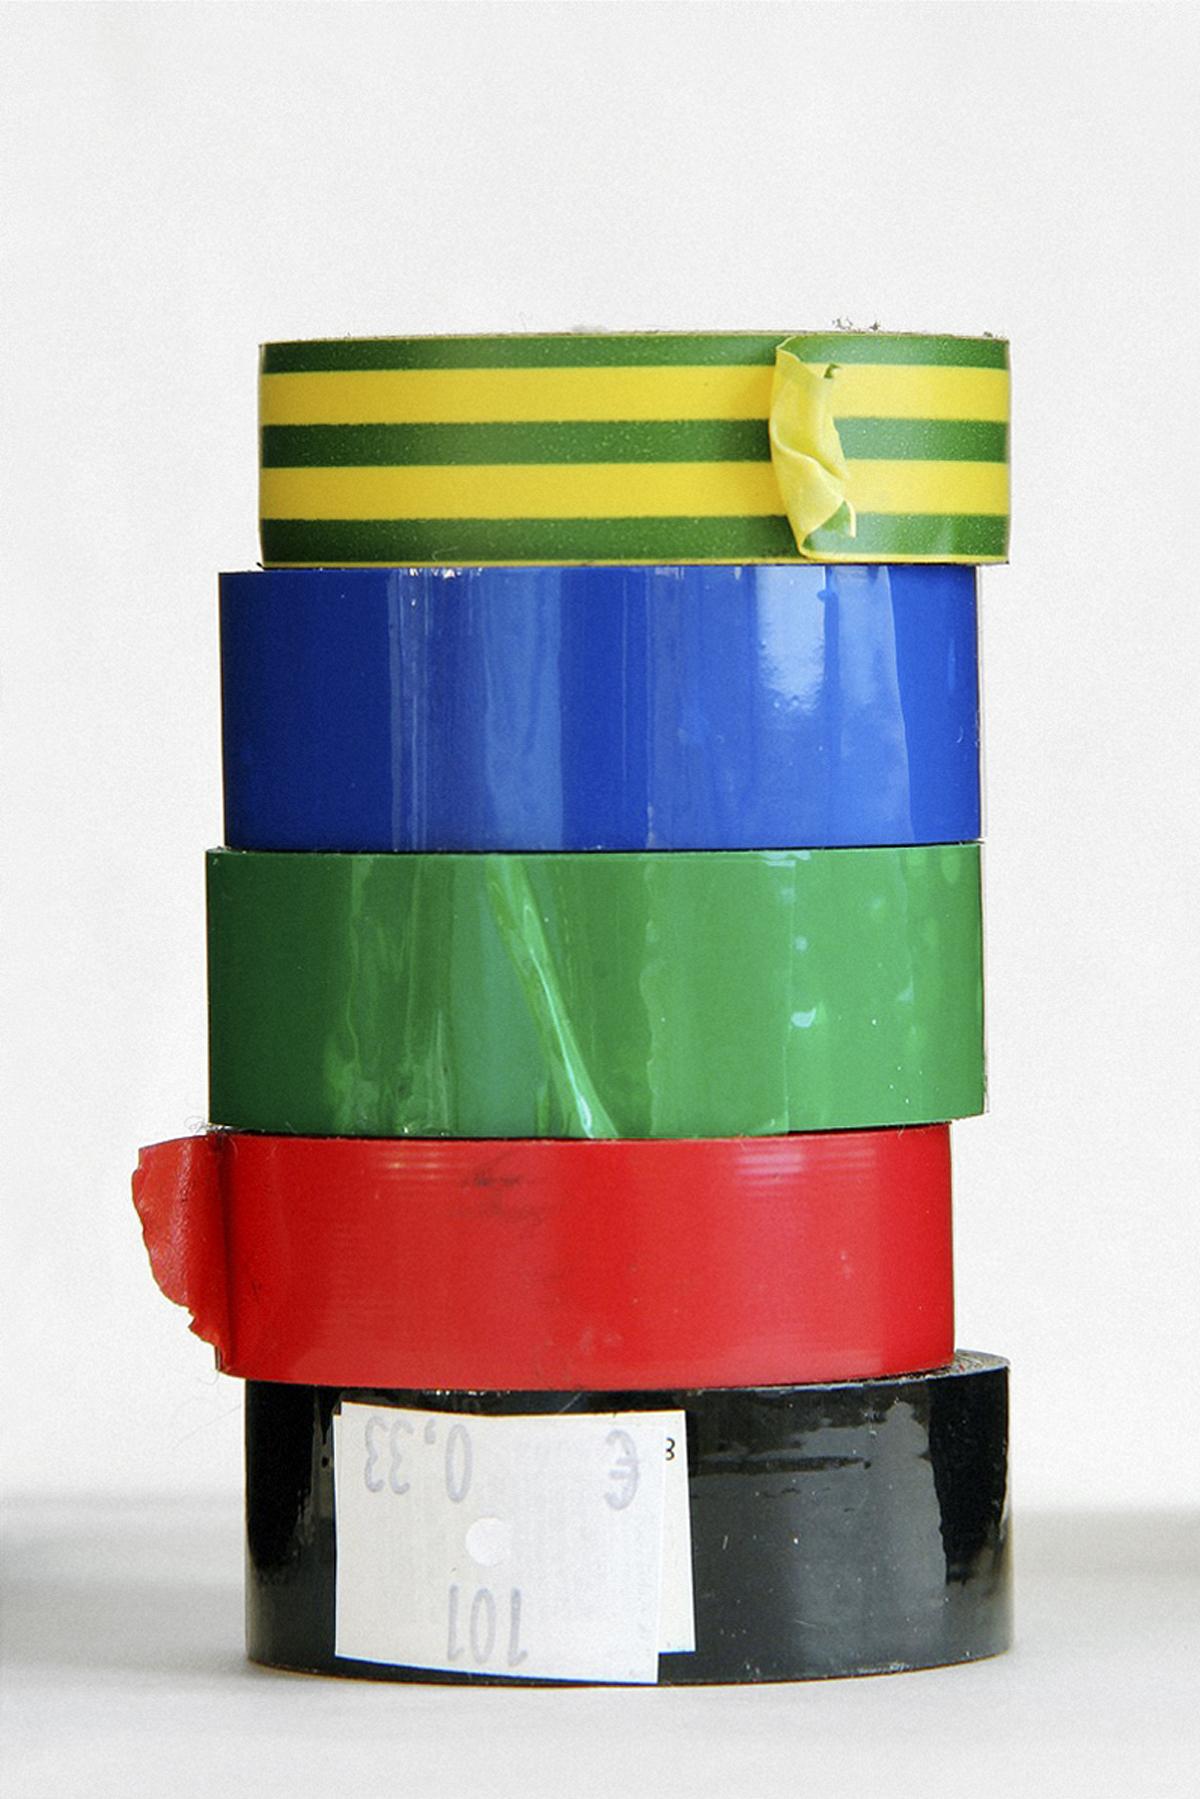 Five Tapes 2011, Epson fine art print, 50 x 35 cm Ed. of 5